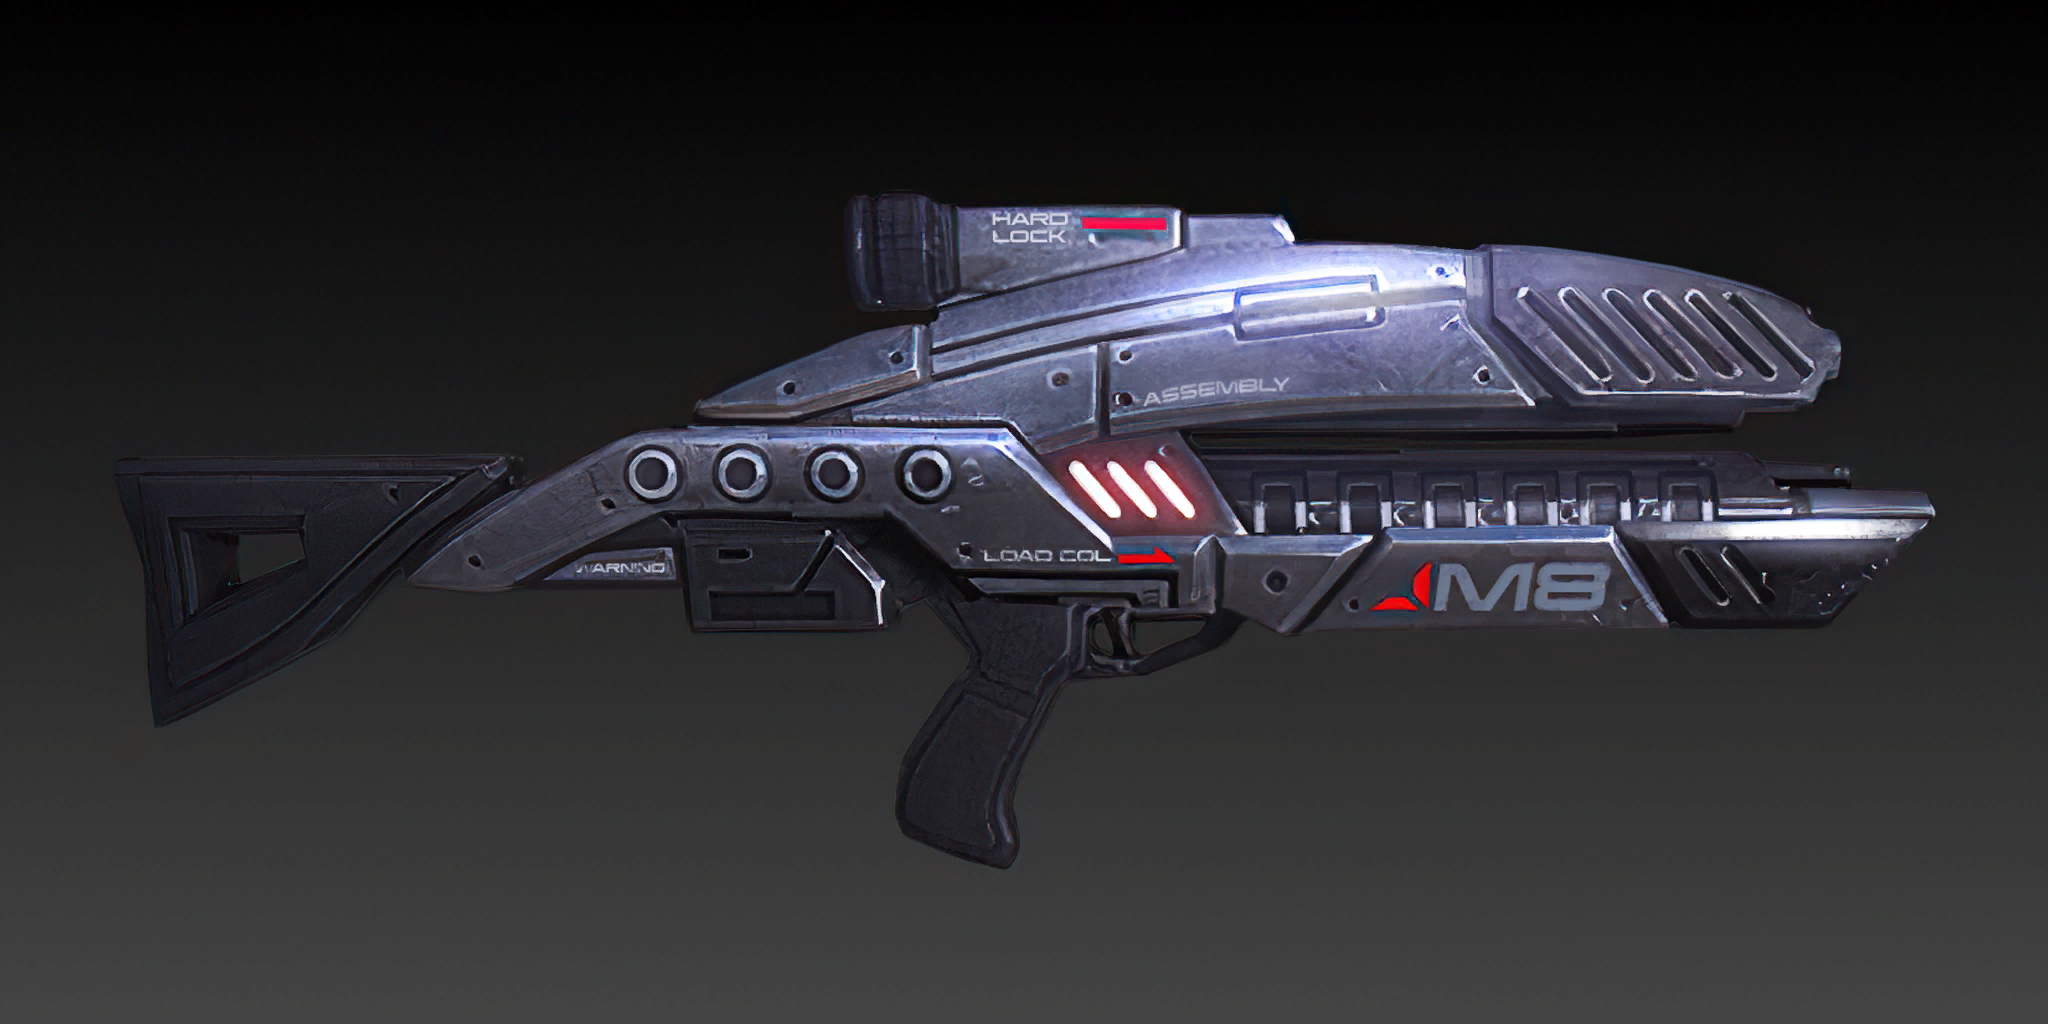 M-8 Avenger   M Effect Wiki   FANDOM powered by Wikia